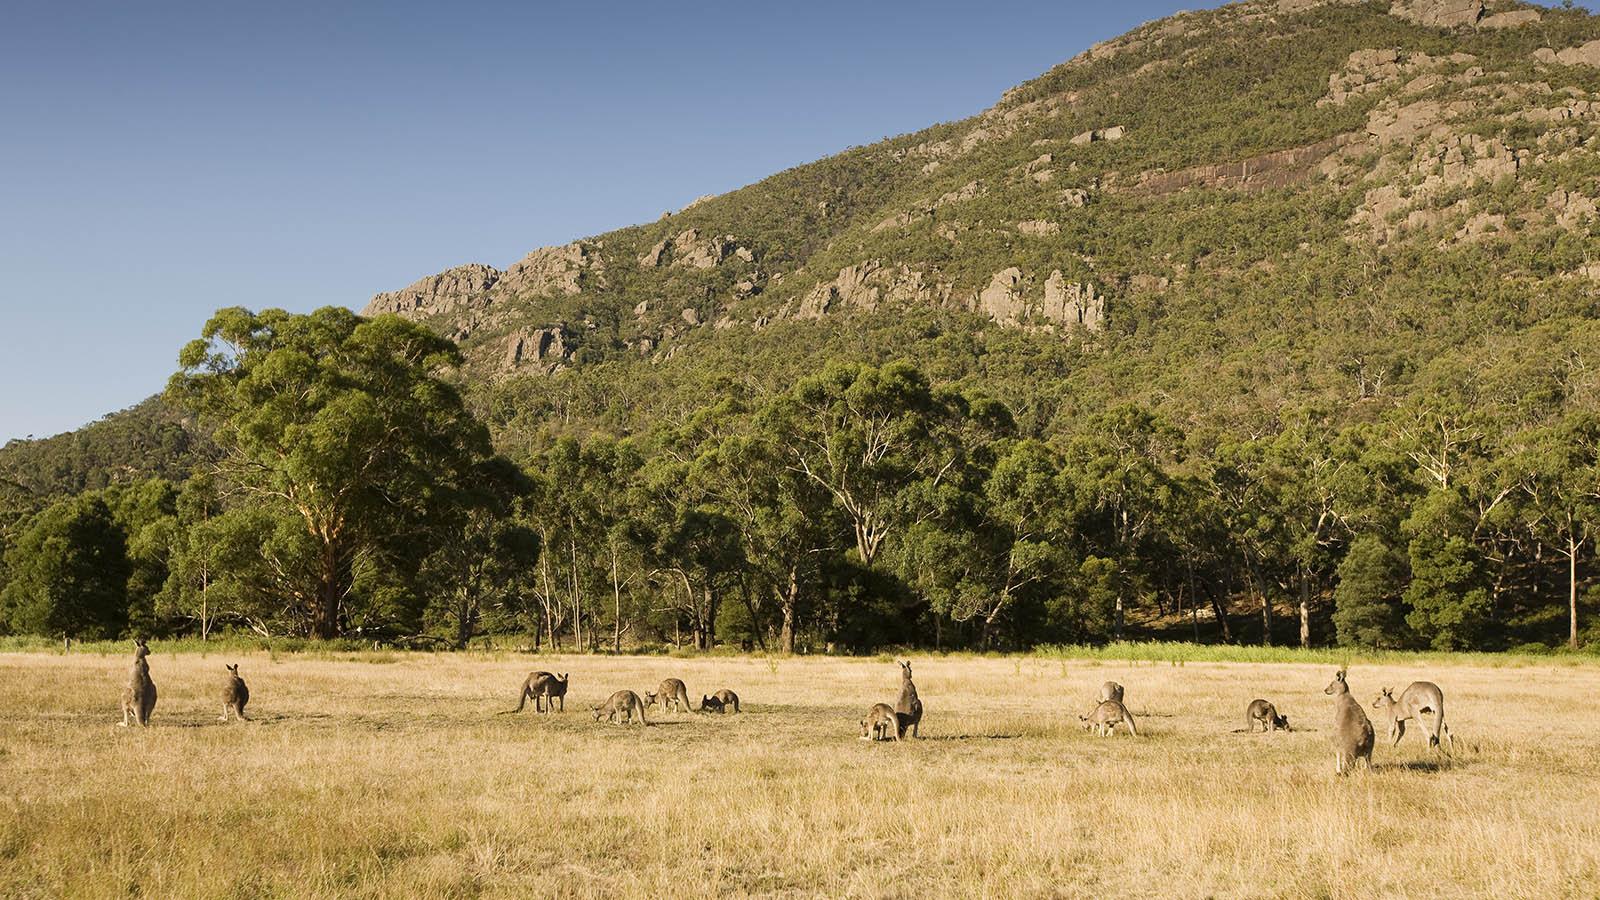 Kangaroos in Halls Gap, The Grampians, Victoria, Australia